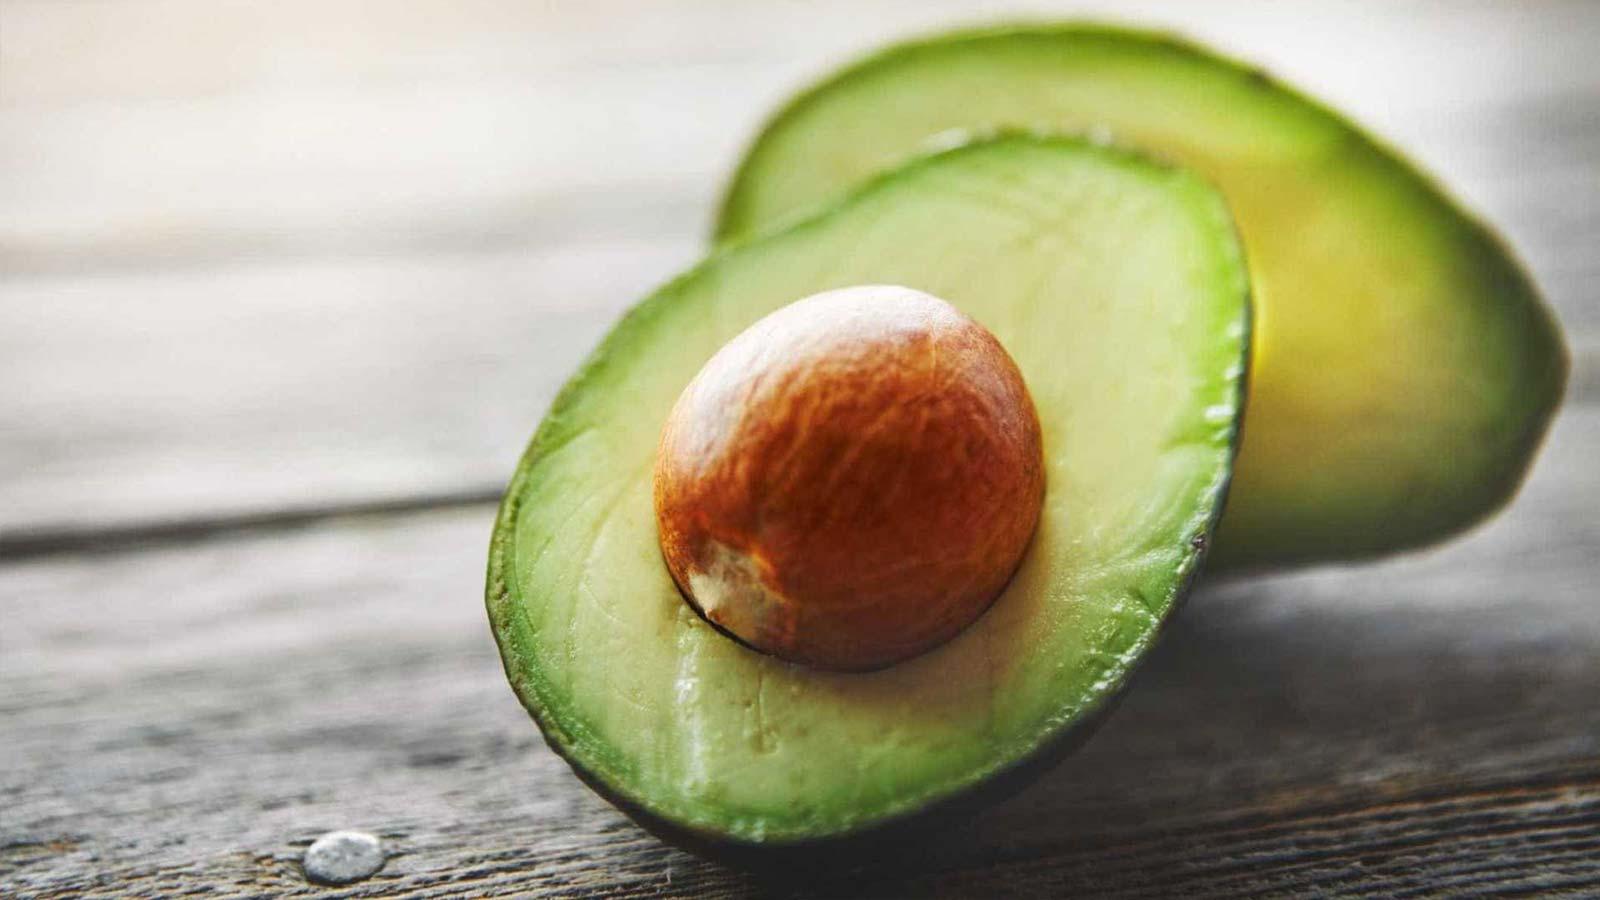 Steeds minder verlies in fruitketen Mexico-Nederland